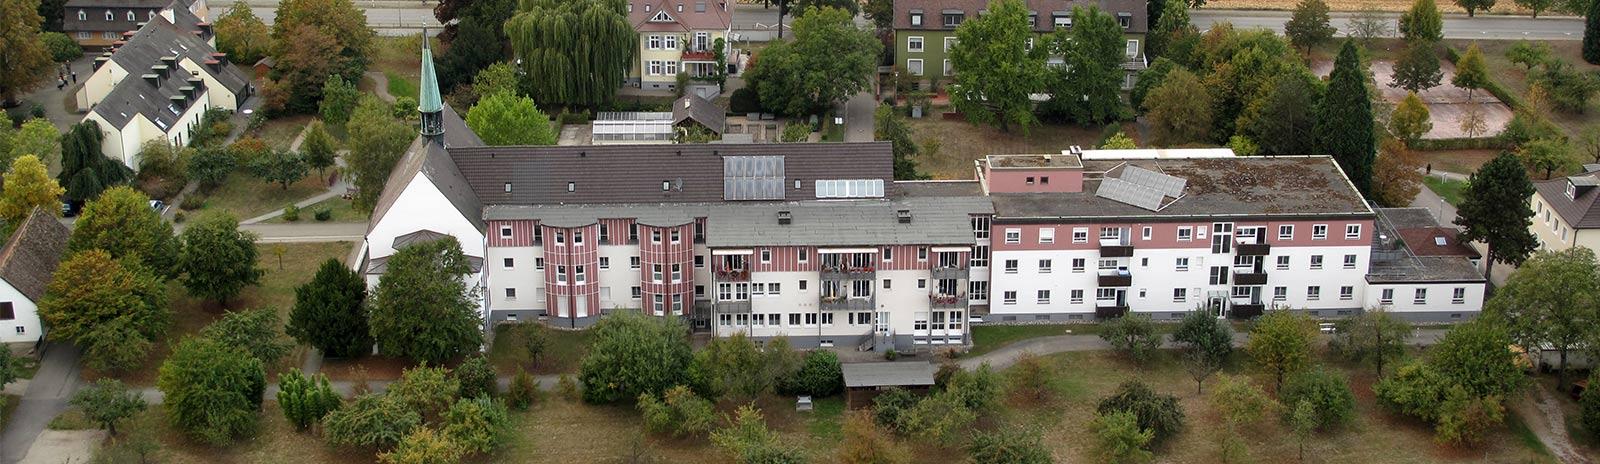 Diakonissenhaus_Nonnenweier_25